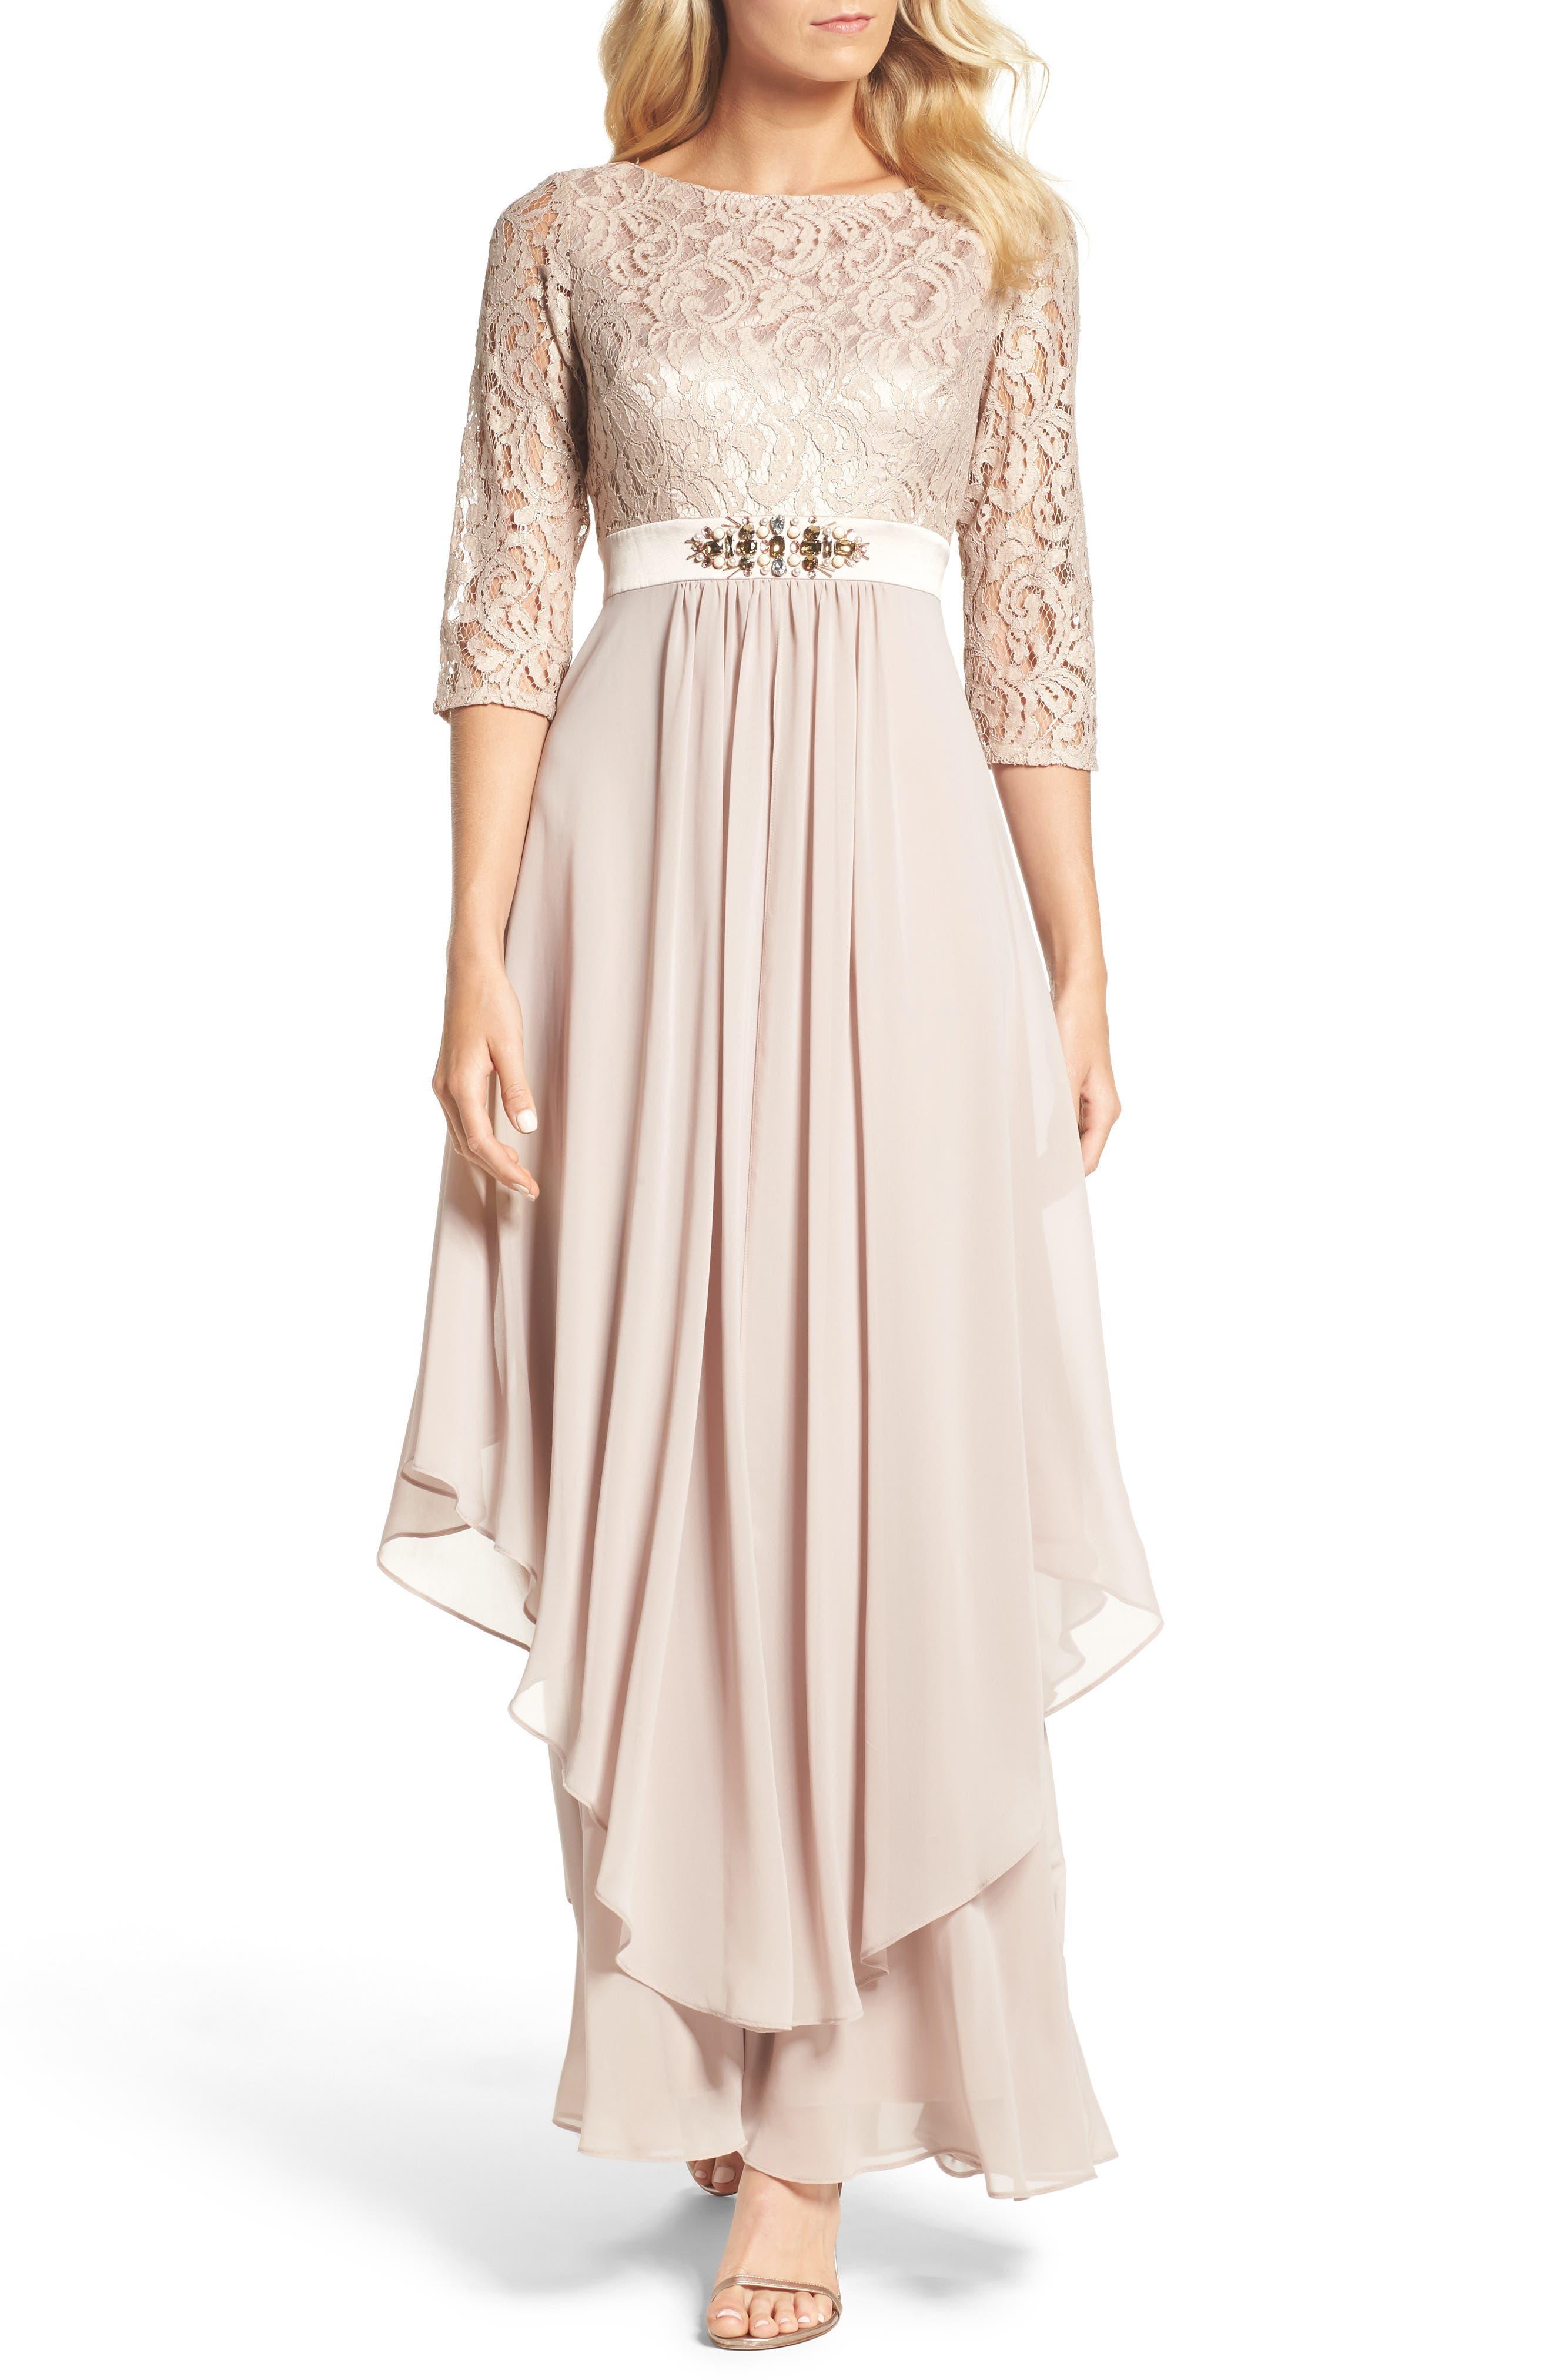 Main Image - Eliza J Embellished Lace & Chiffon Gown